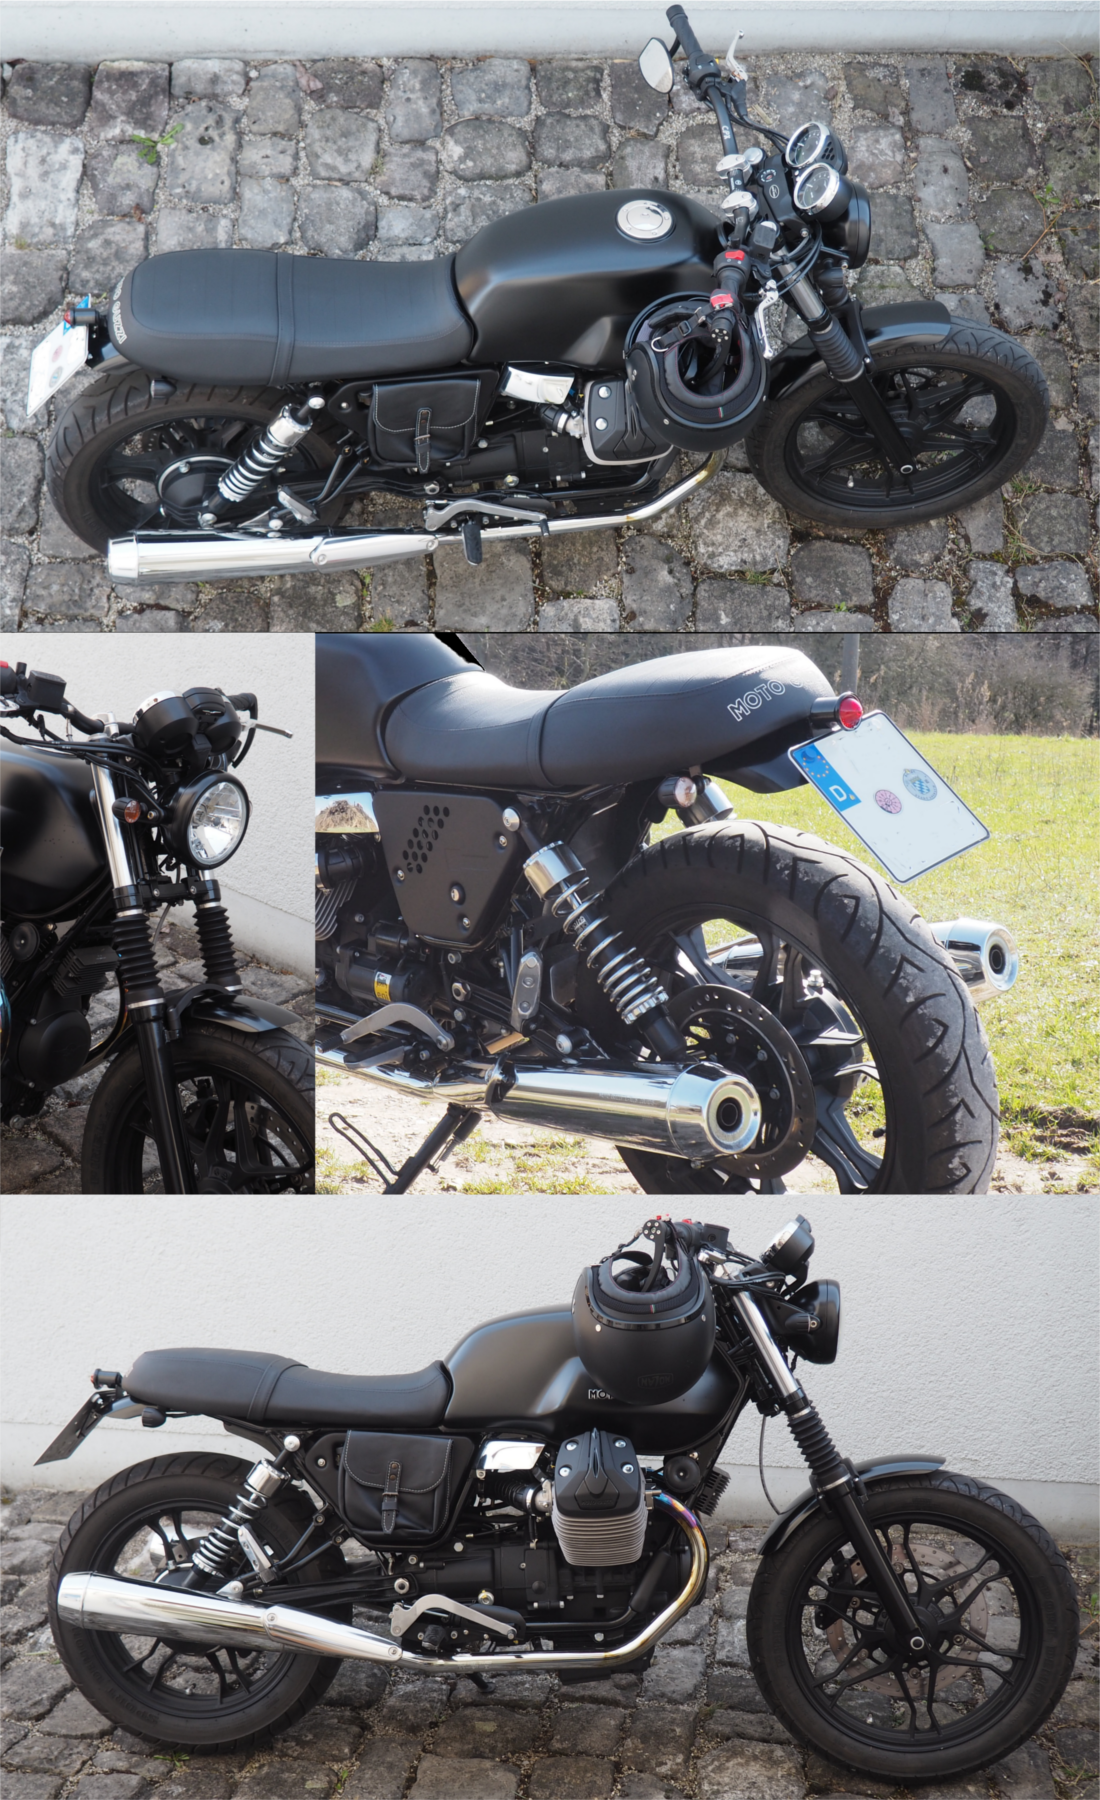 Moto Guzzi V7 Stone 2013 Custom Cafe Racer Cafe Racers Moto